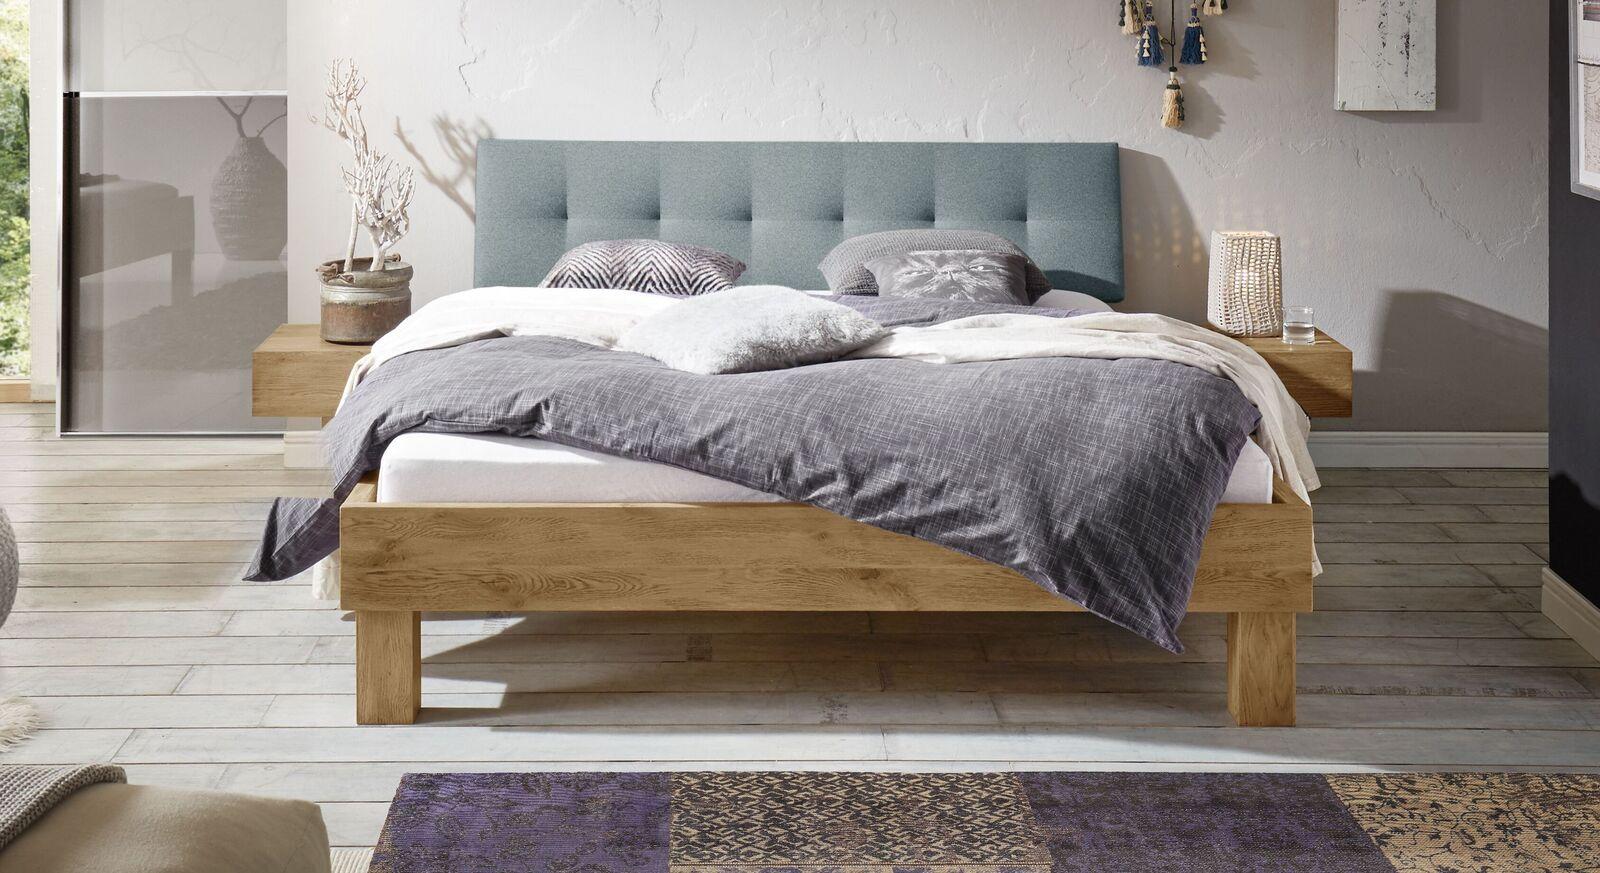 Bett Santa Luiza aus blaugrauem Veloursstoff